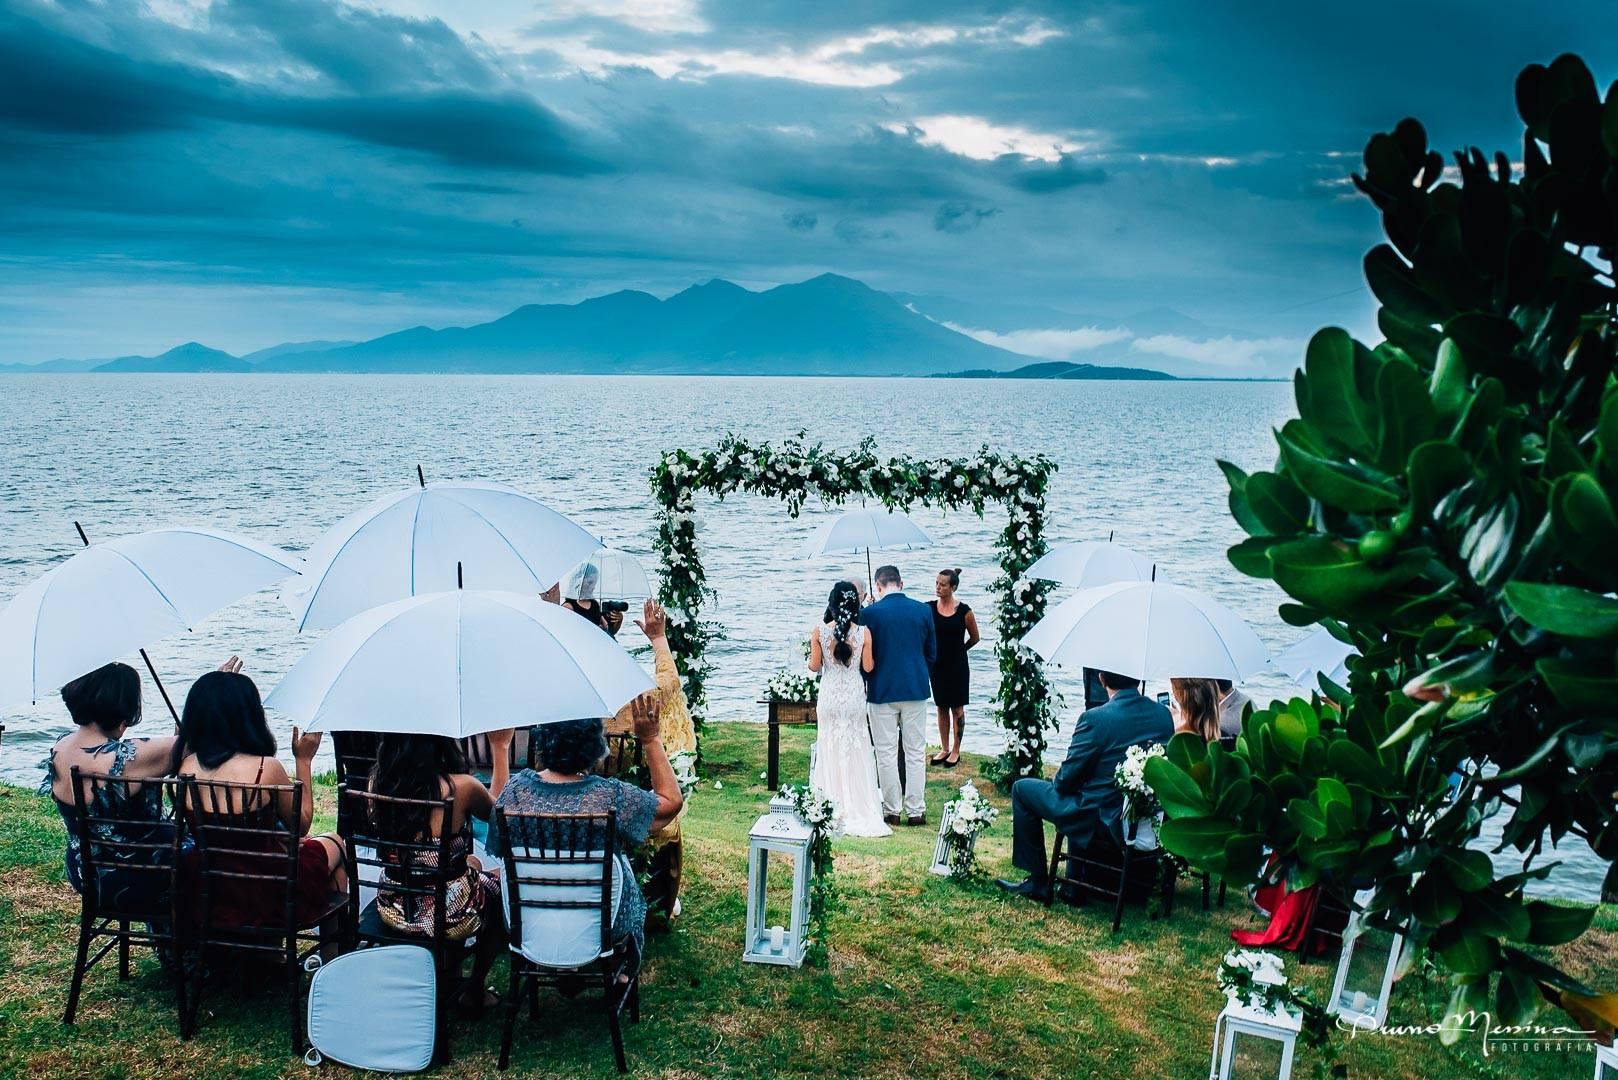 casamento-ao-ar-livre-casamento-na-praia-fotos-casamento-de-dia60